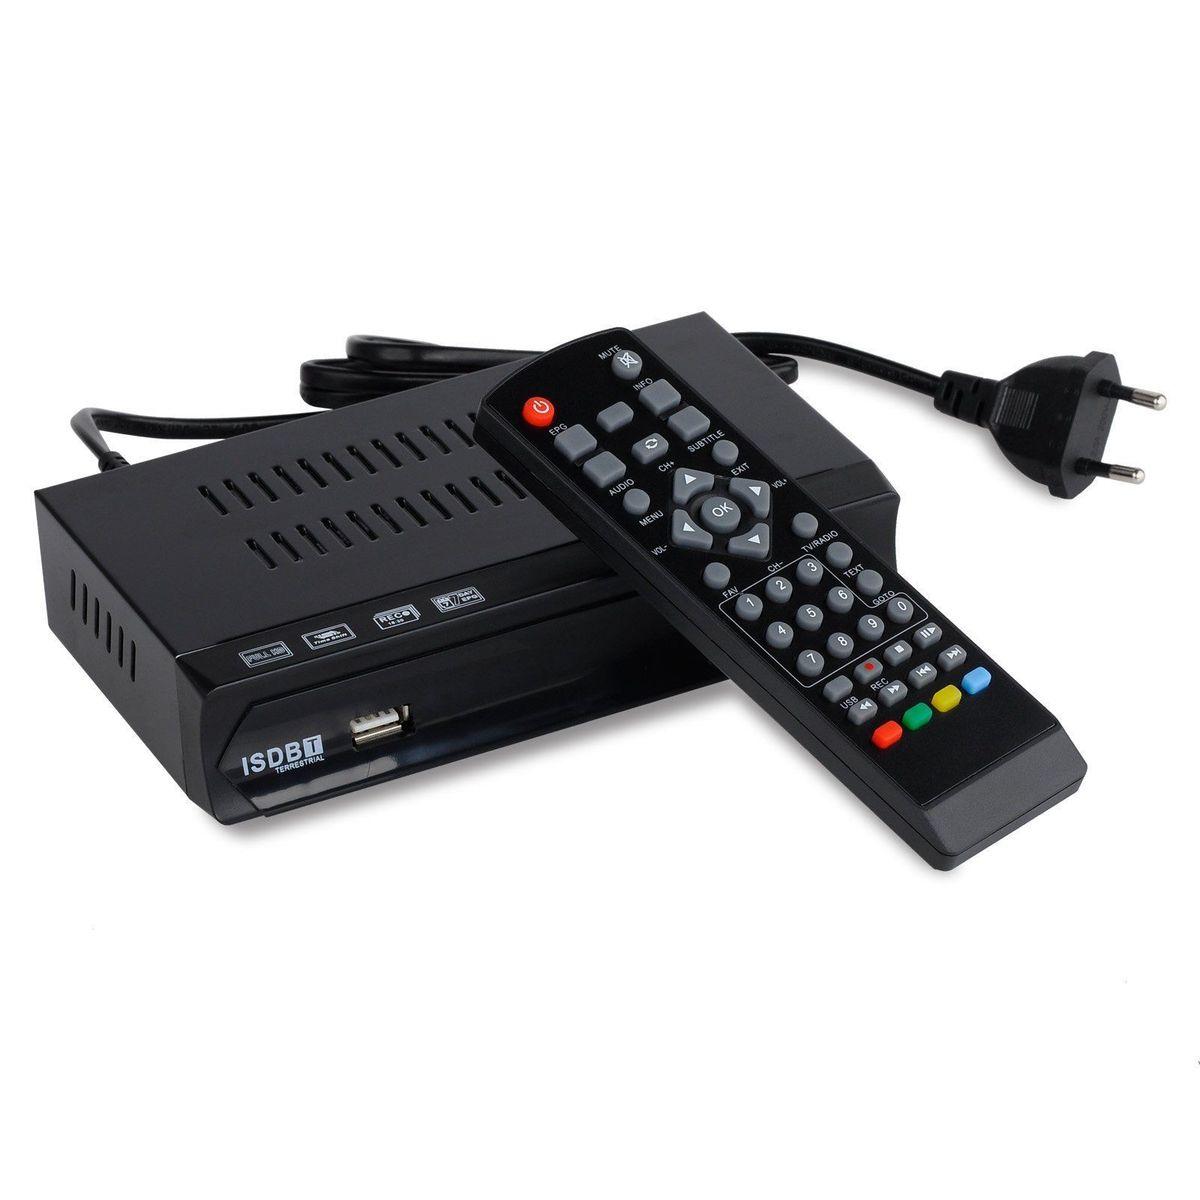 FTA Brazil Peru Digital Terrestrial ISDB-T TV Tuner Receiver Set Top Box Full HD 1080P USB Recorder EPG HDMI Out VHF UHF Antenna